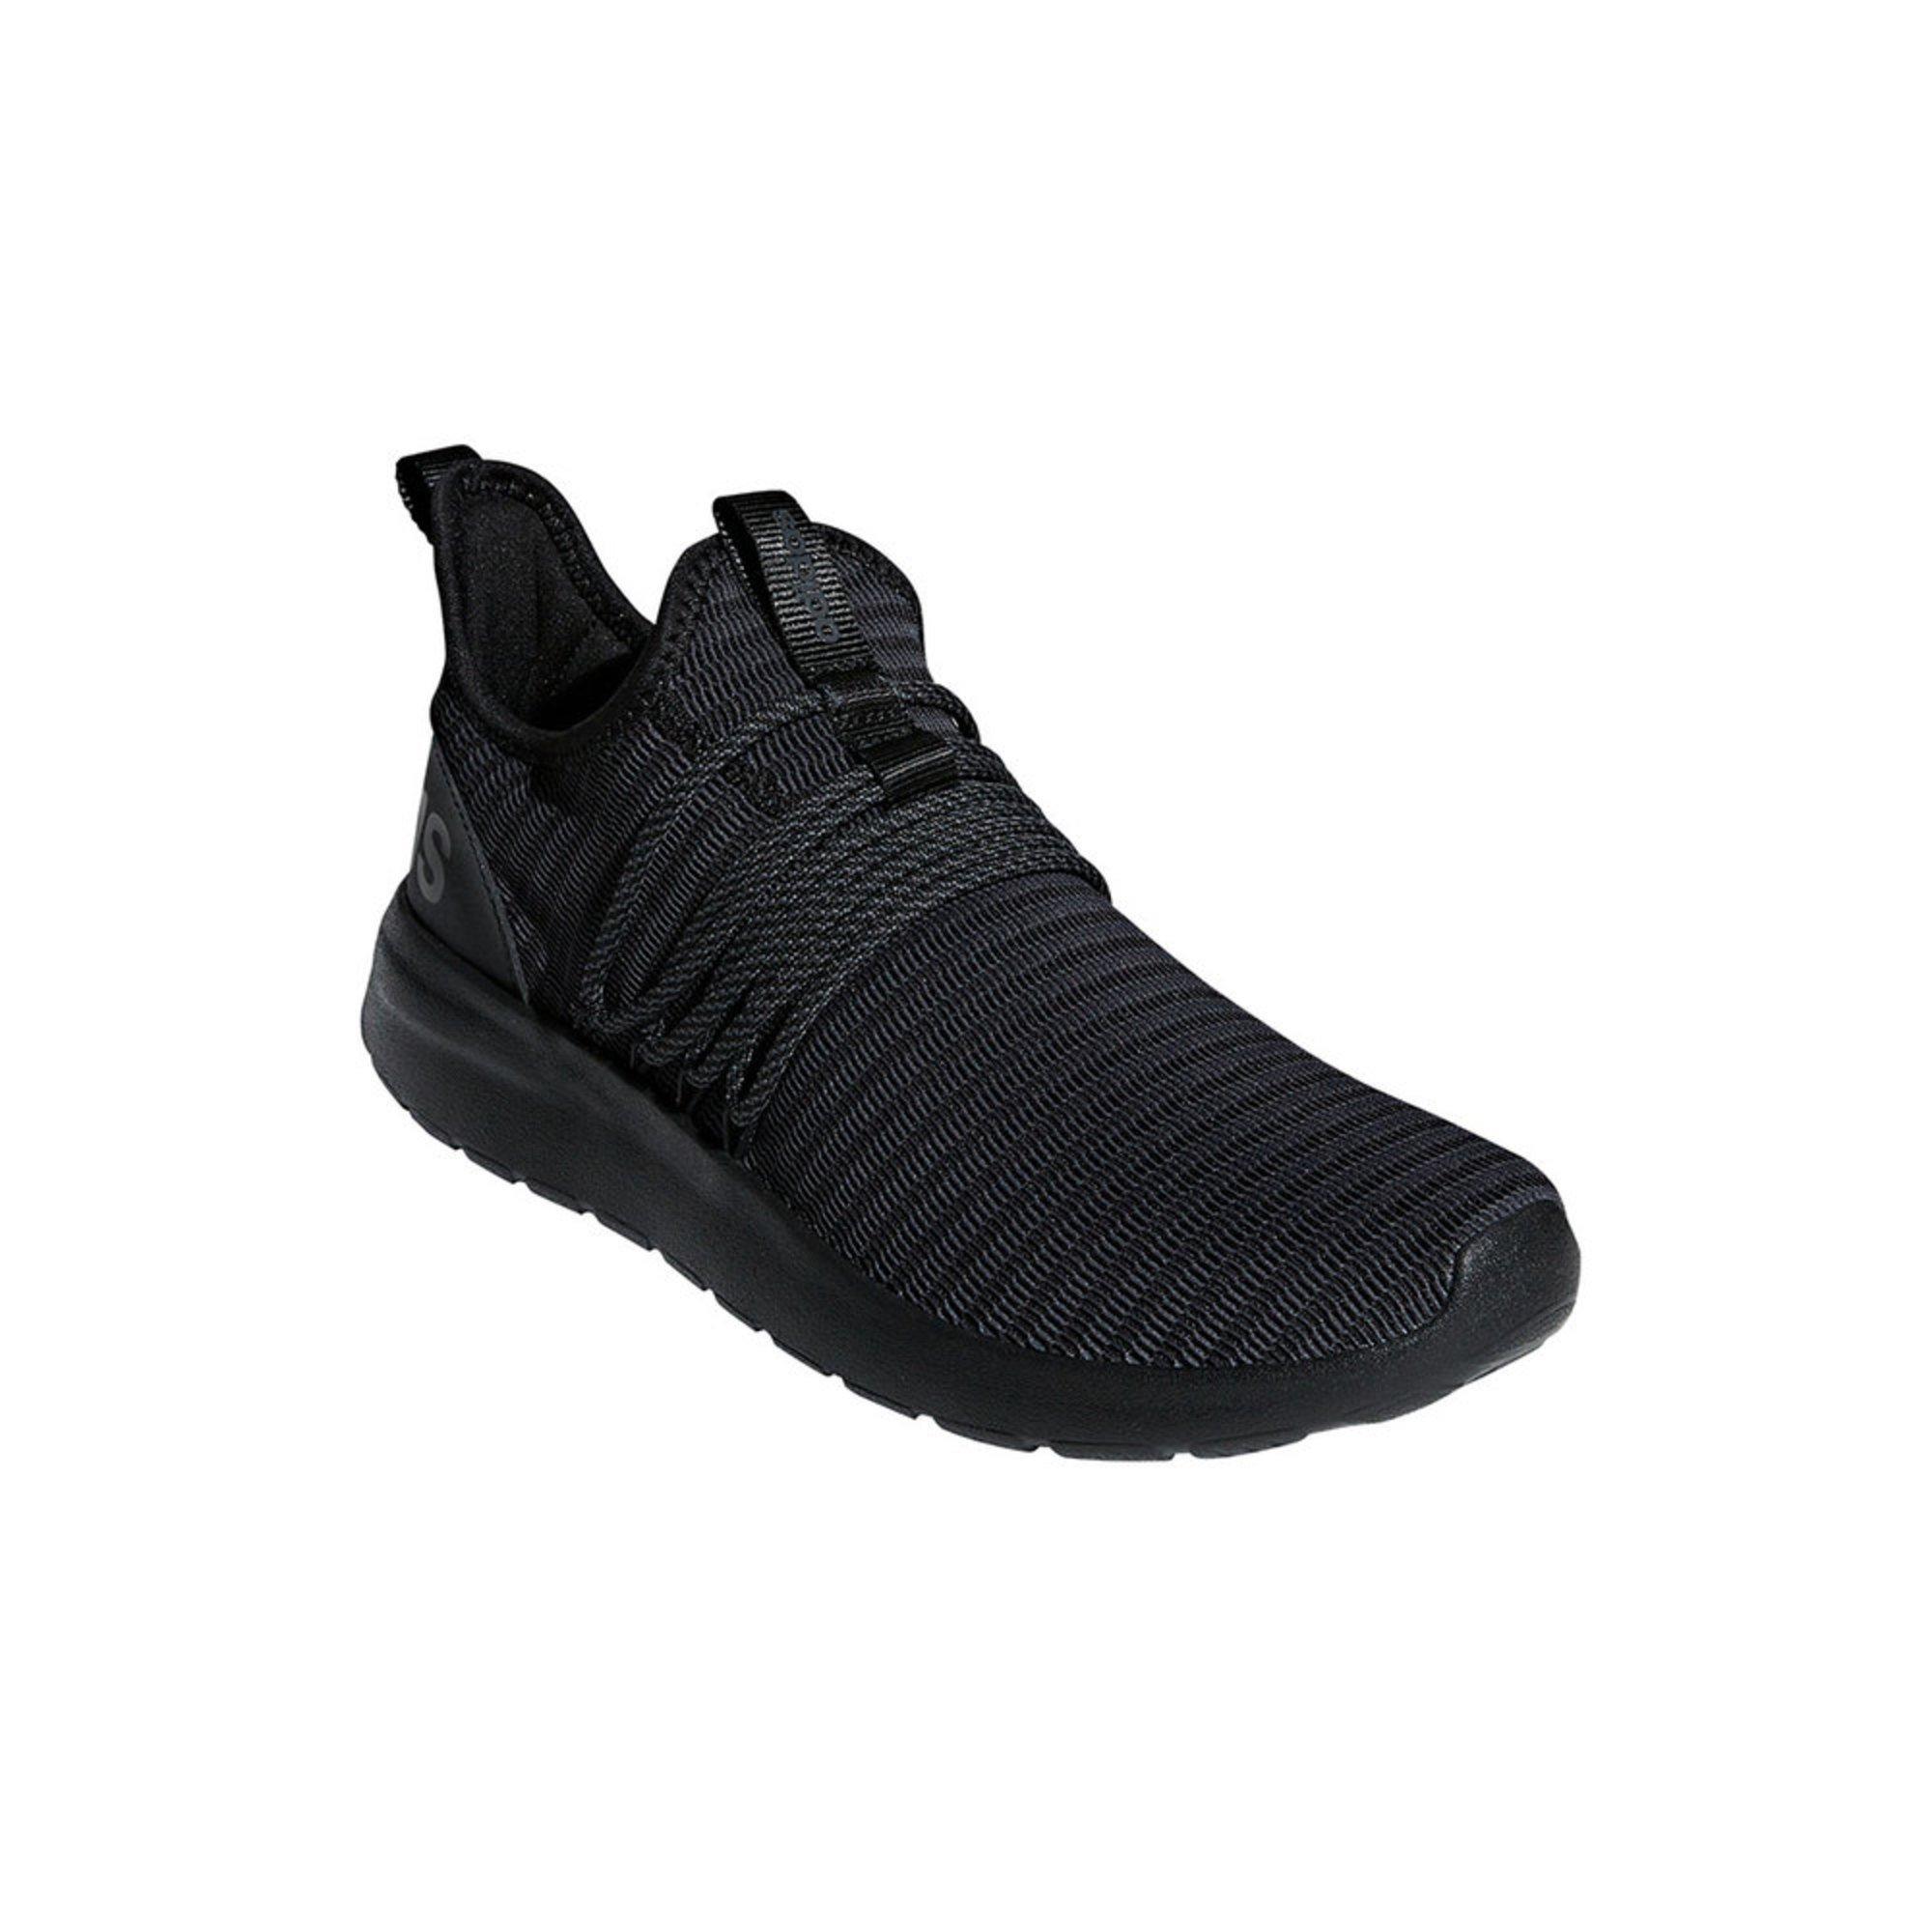 9cbc80349bc2e Adidas Men's Lite Racer Adapt Running Shoe | Men's Running Shoes ...